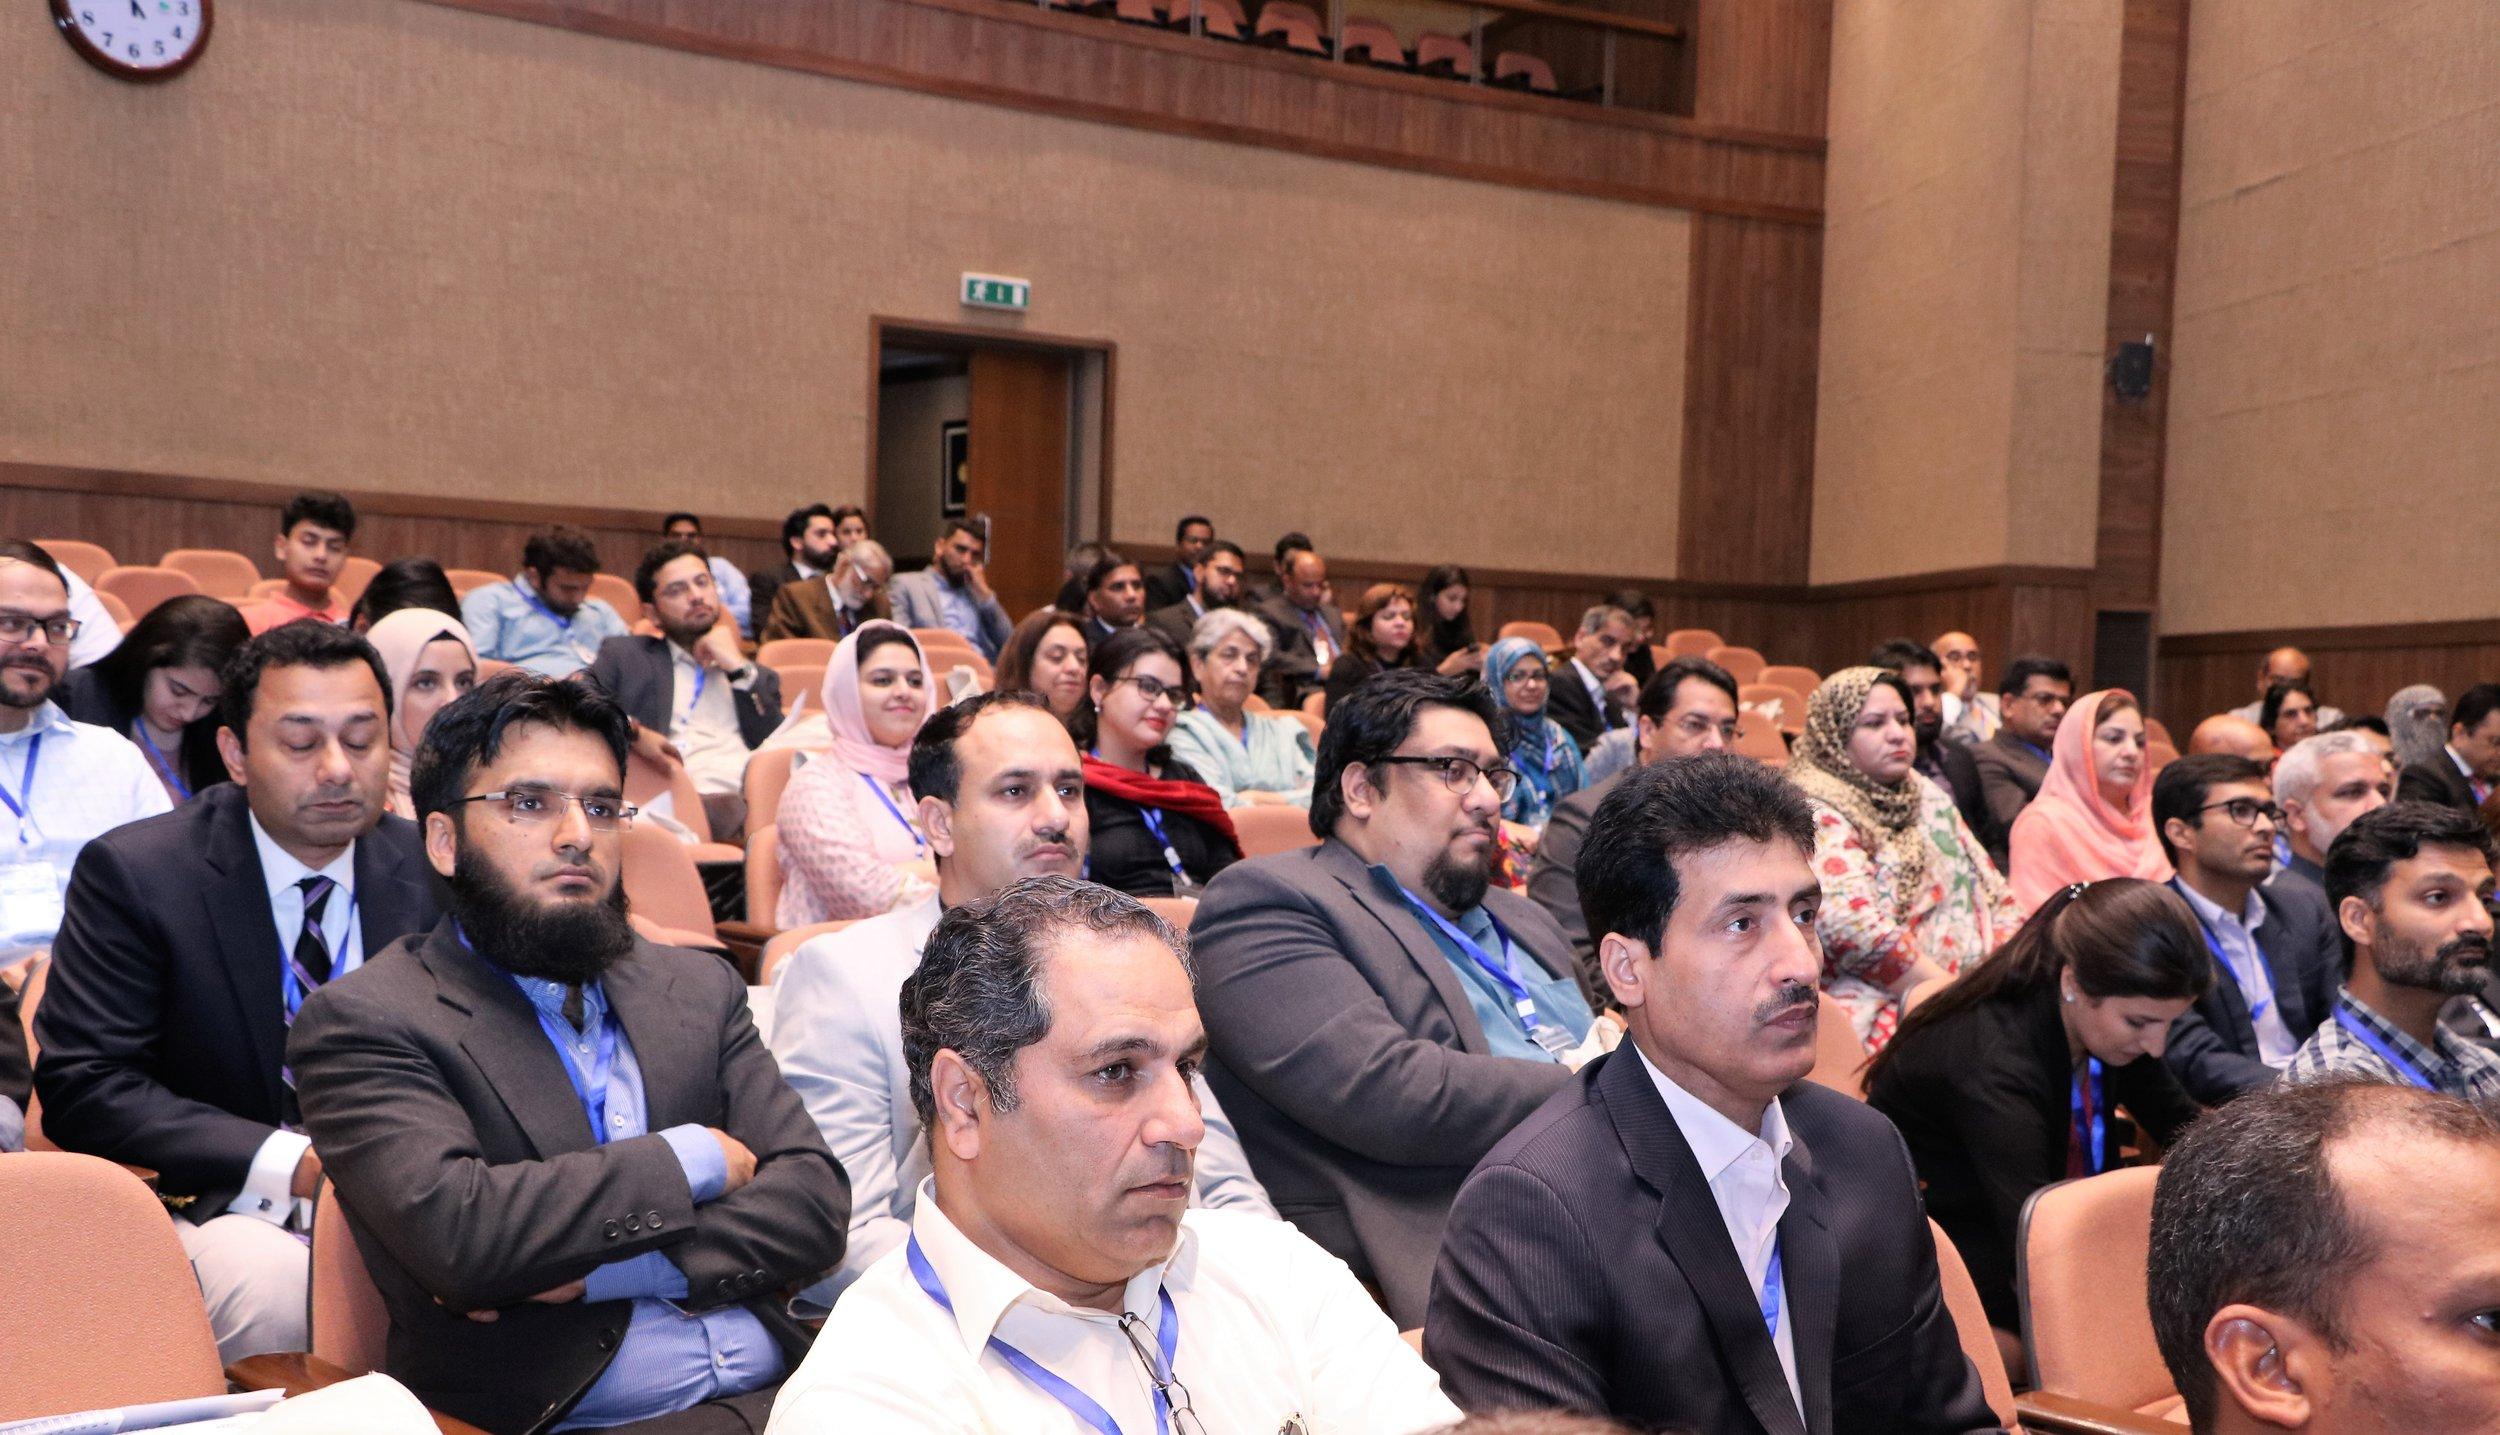 14th Alumni Conference 2.jpg